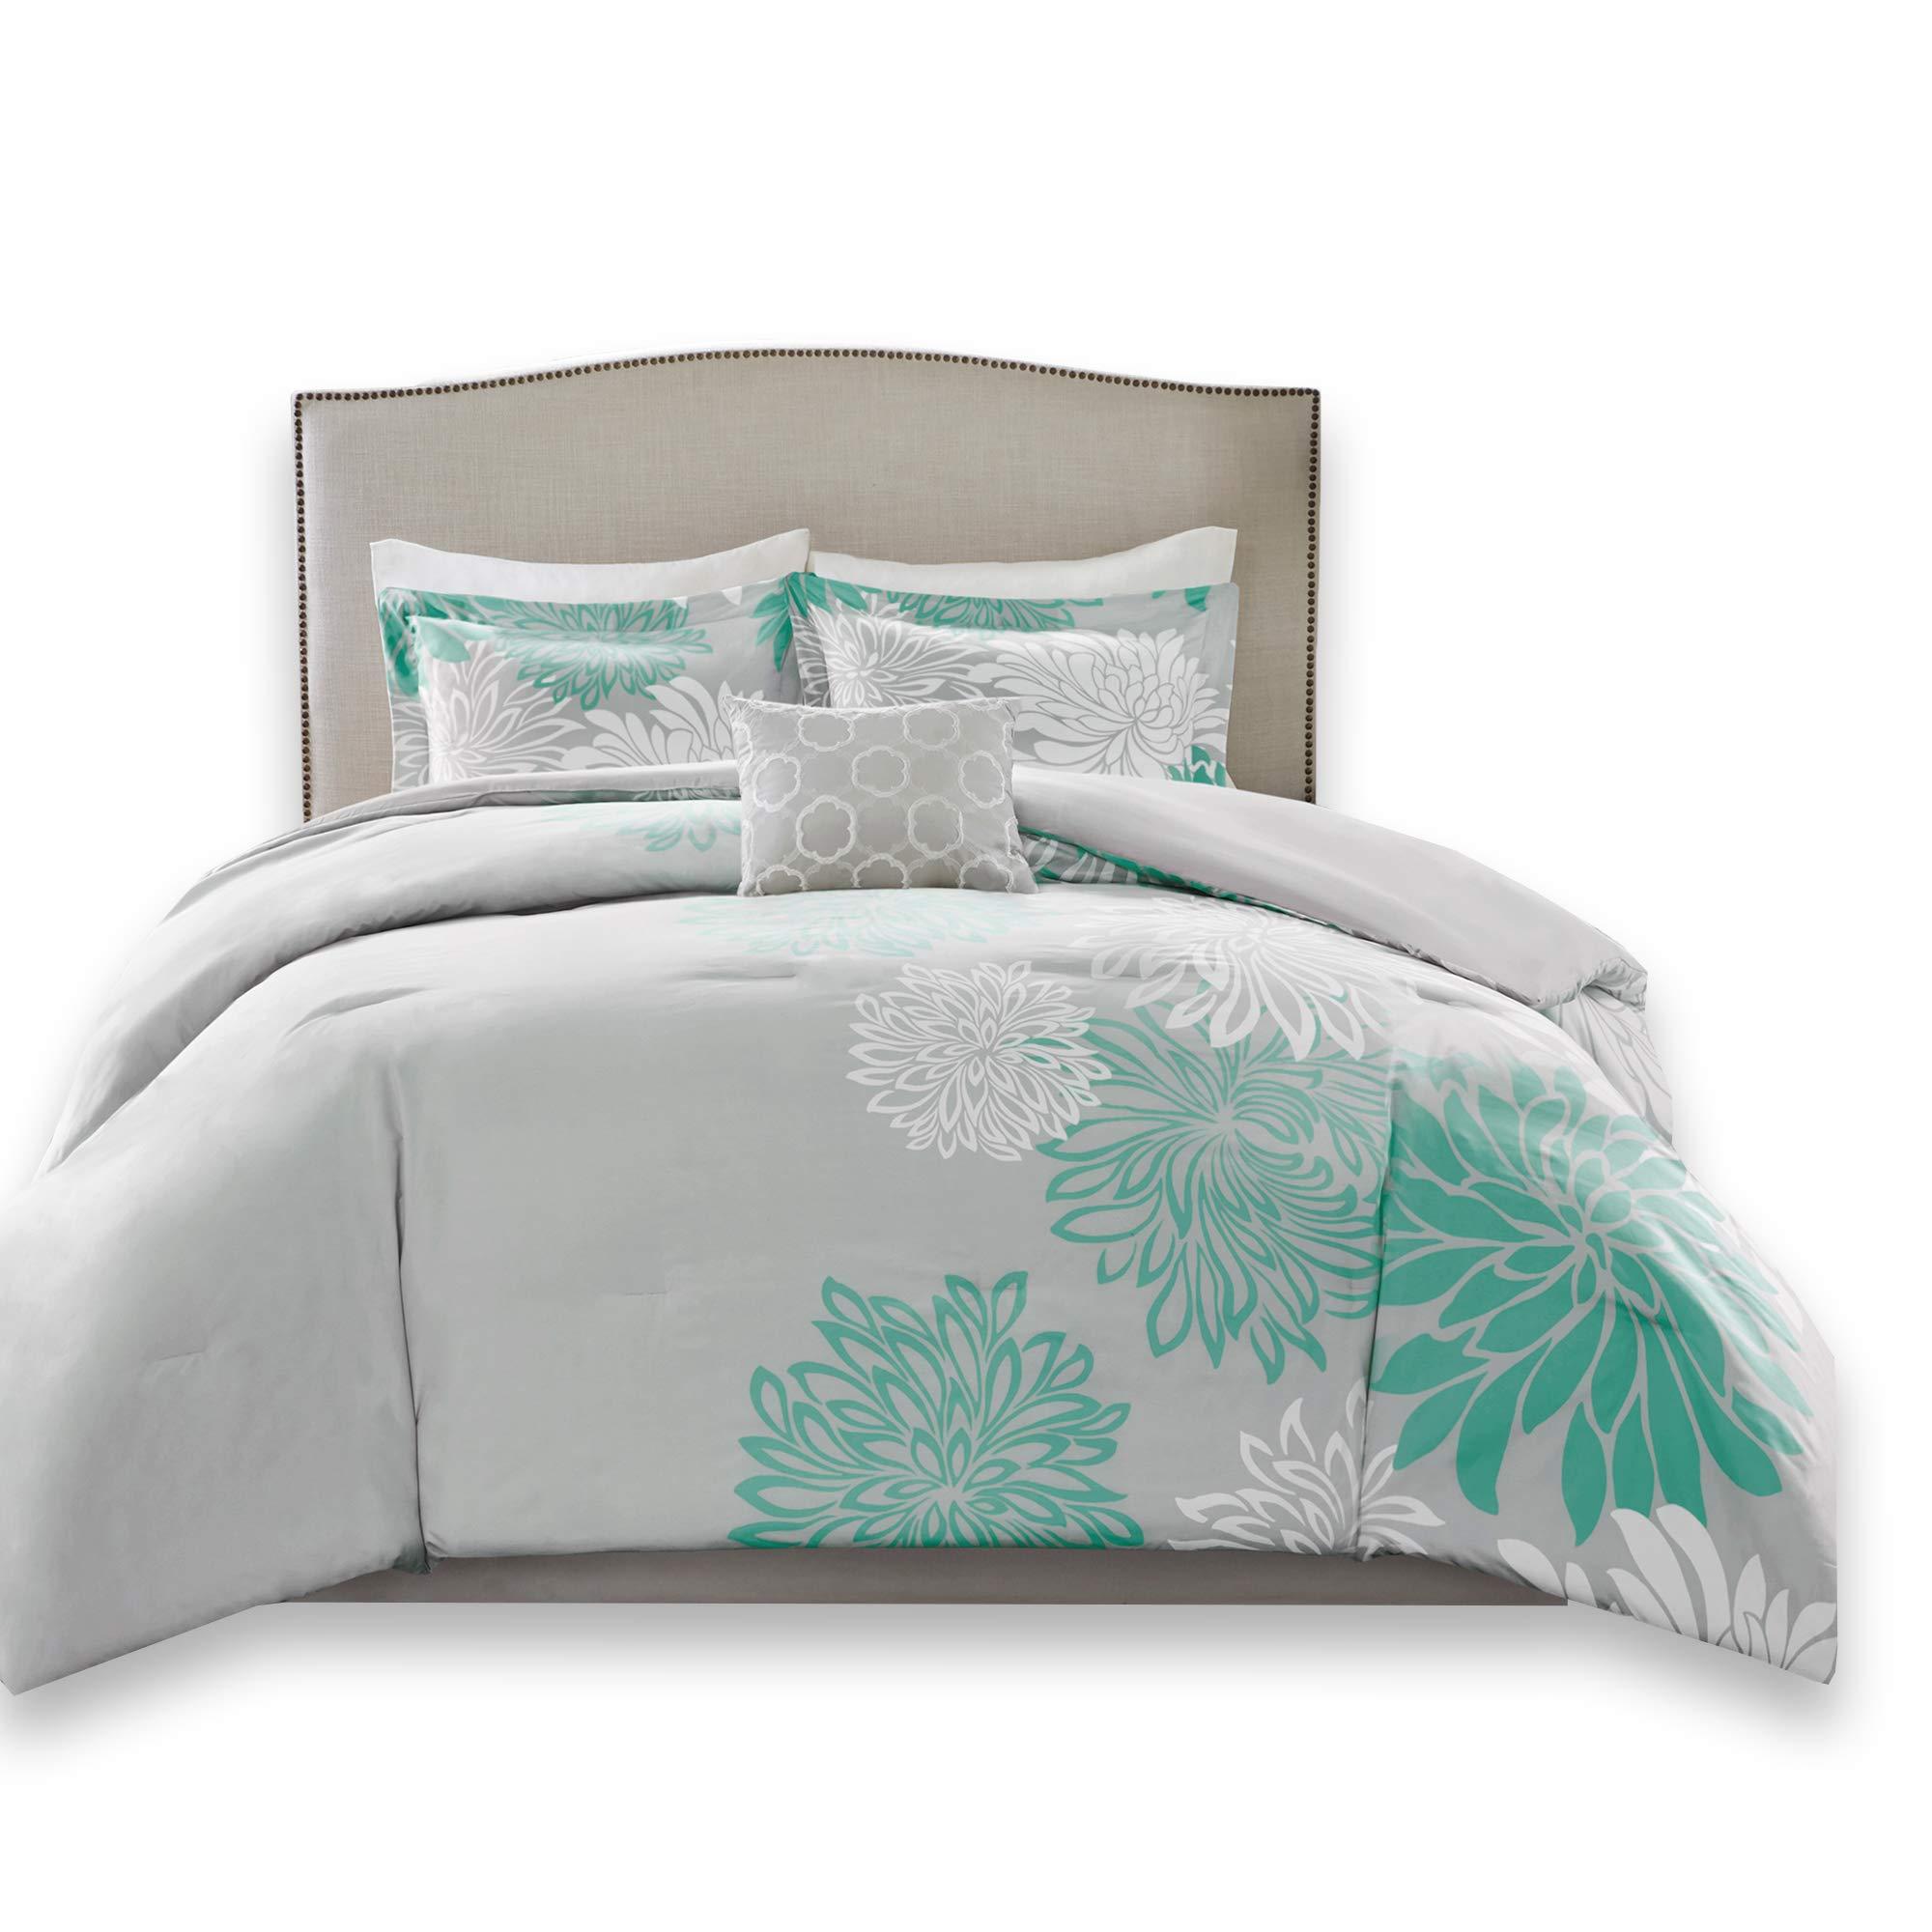 Comfort Spaces Comforter Printed Decorative